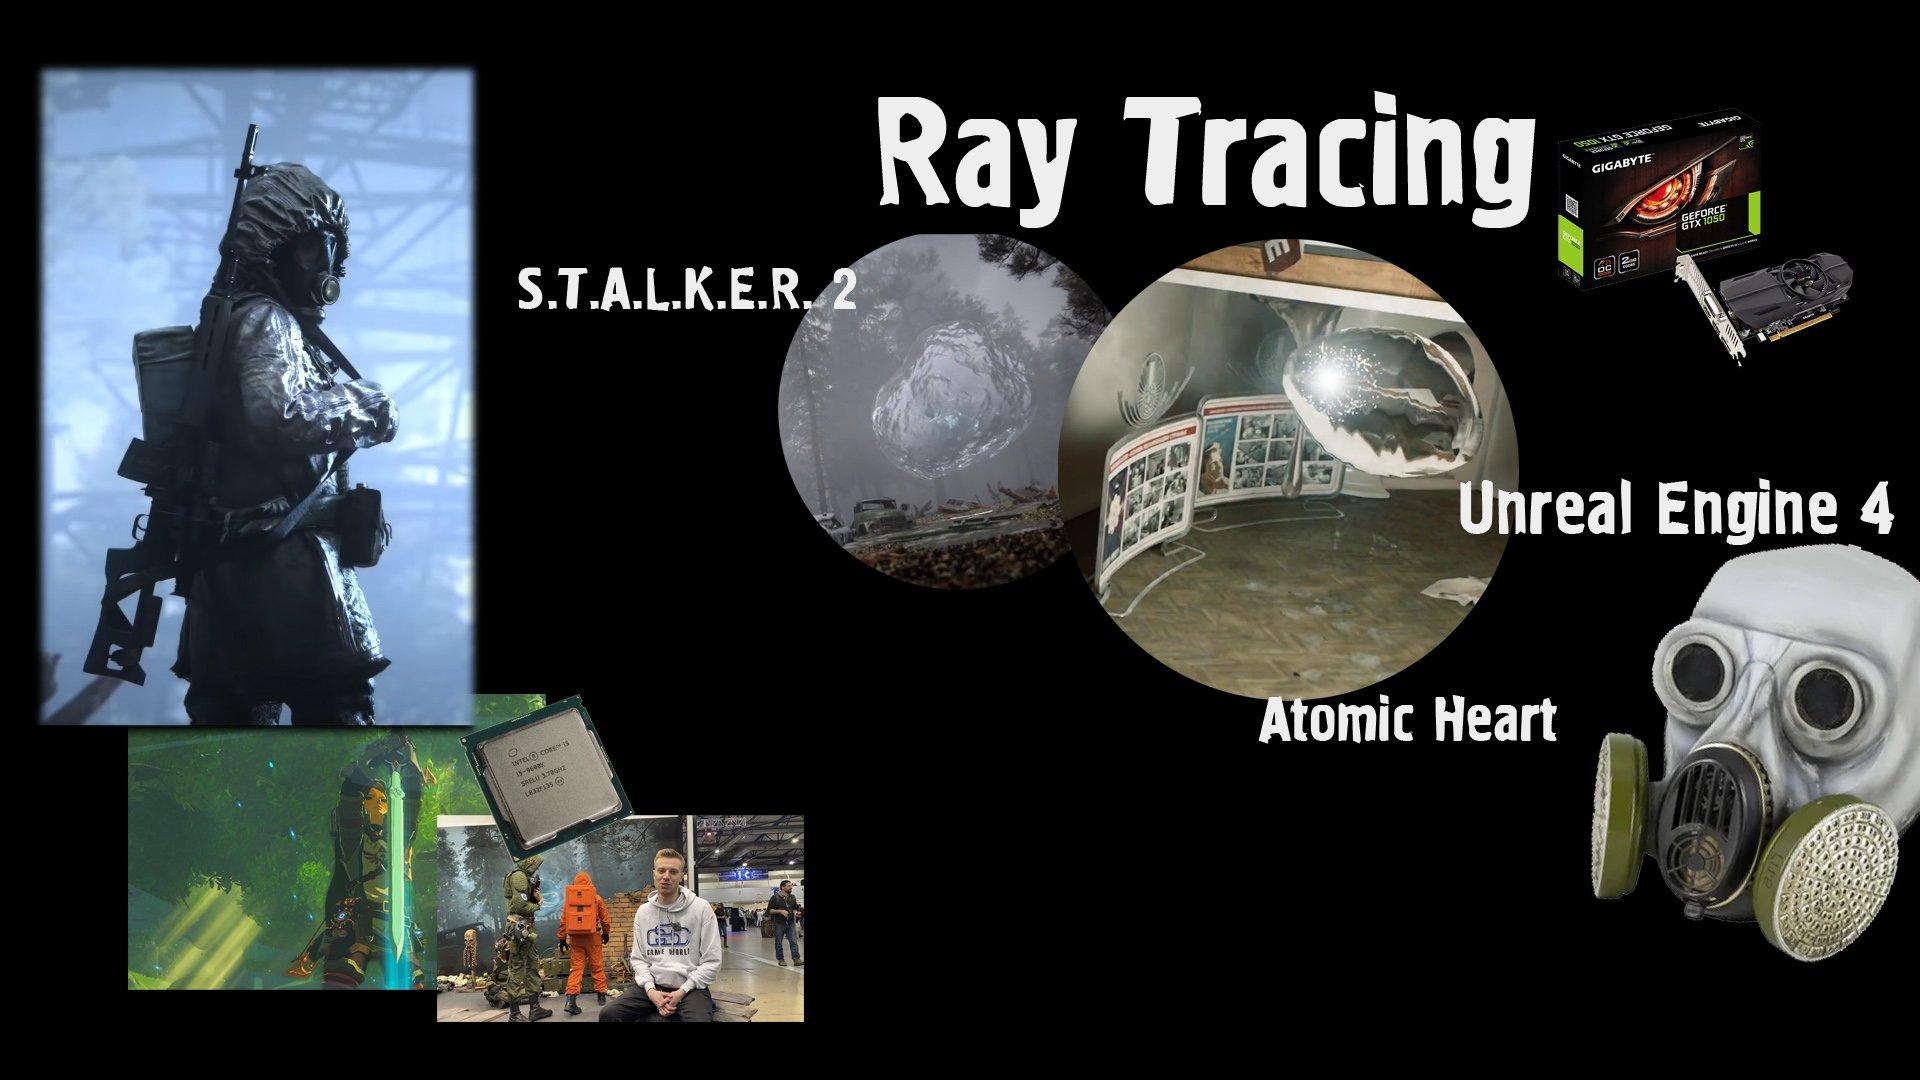 S.T.A.L.K.E.R. 2, IGN, DirectX Raytracing, Системные требования, снег на UE4, любимая игра Бочарова.